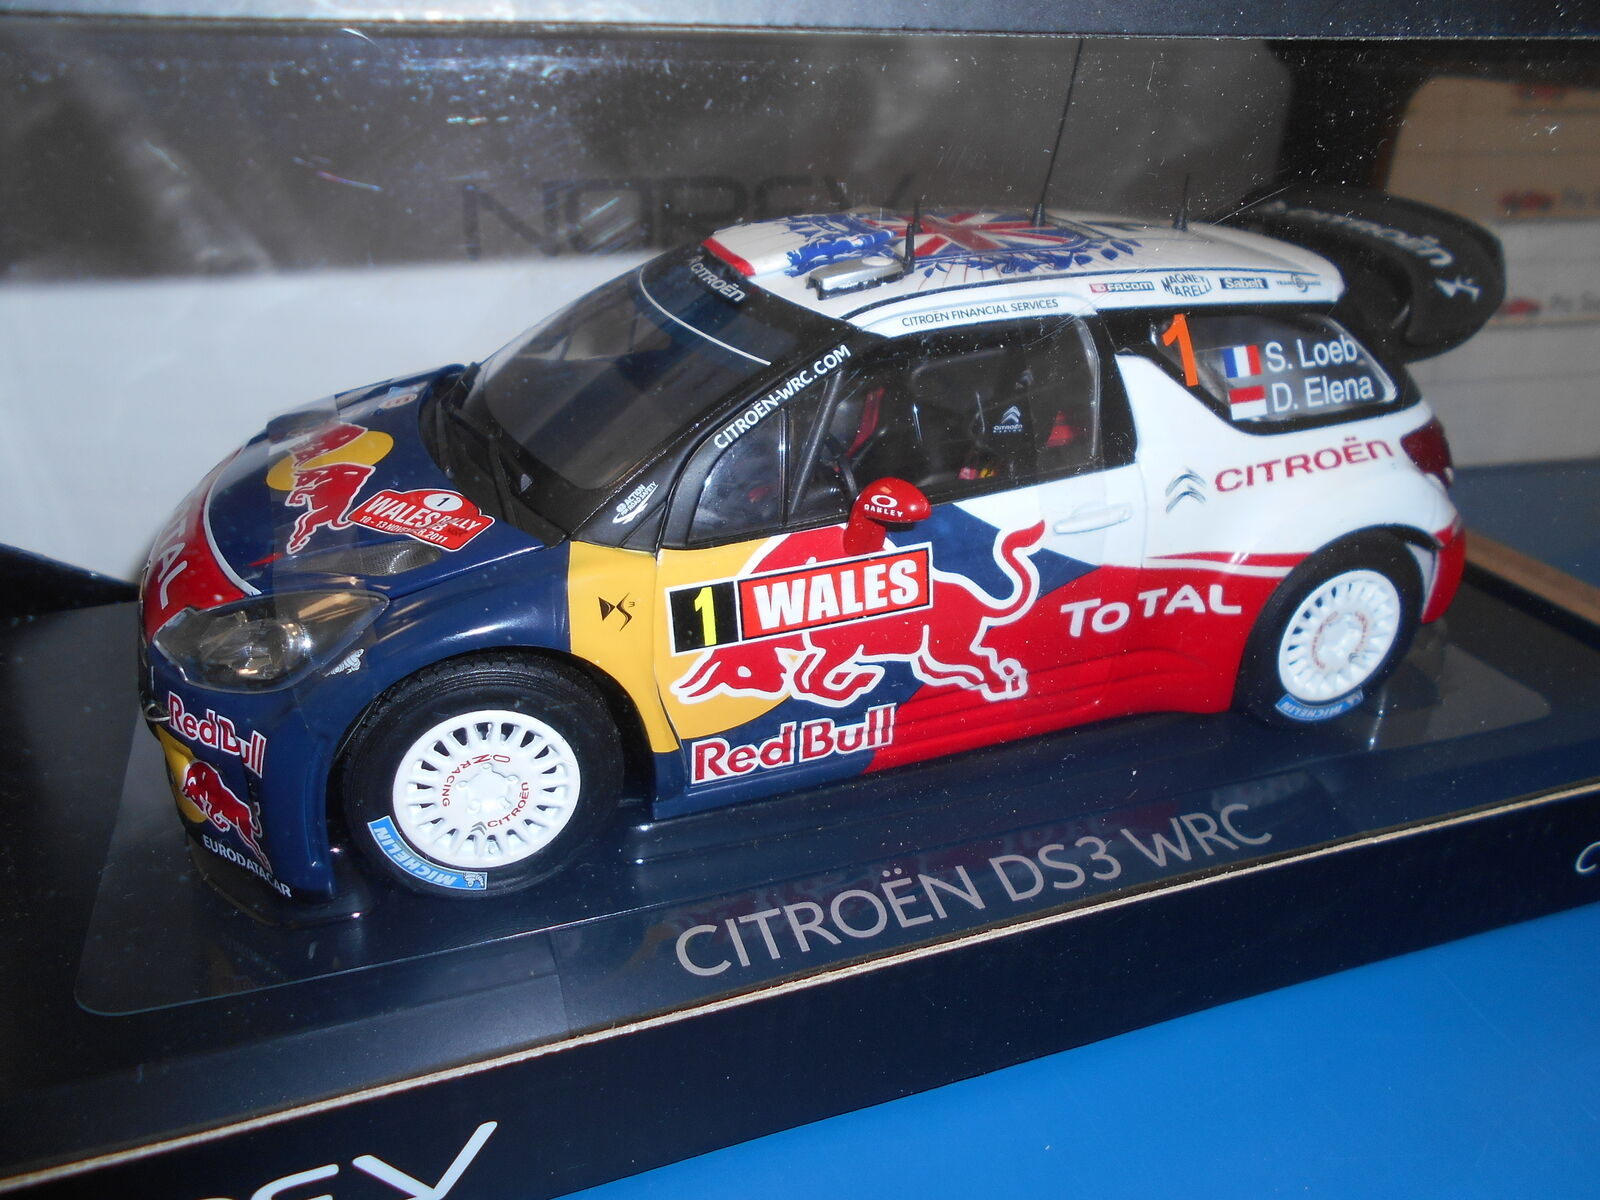 Nv181557 by Norev citroen ds3 WRC  1 Toilet Loeb-Elena 2011 rallye G.B. 1 18